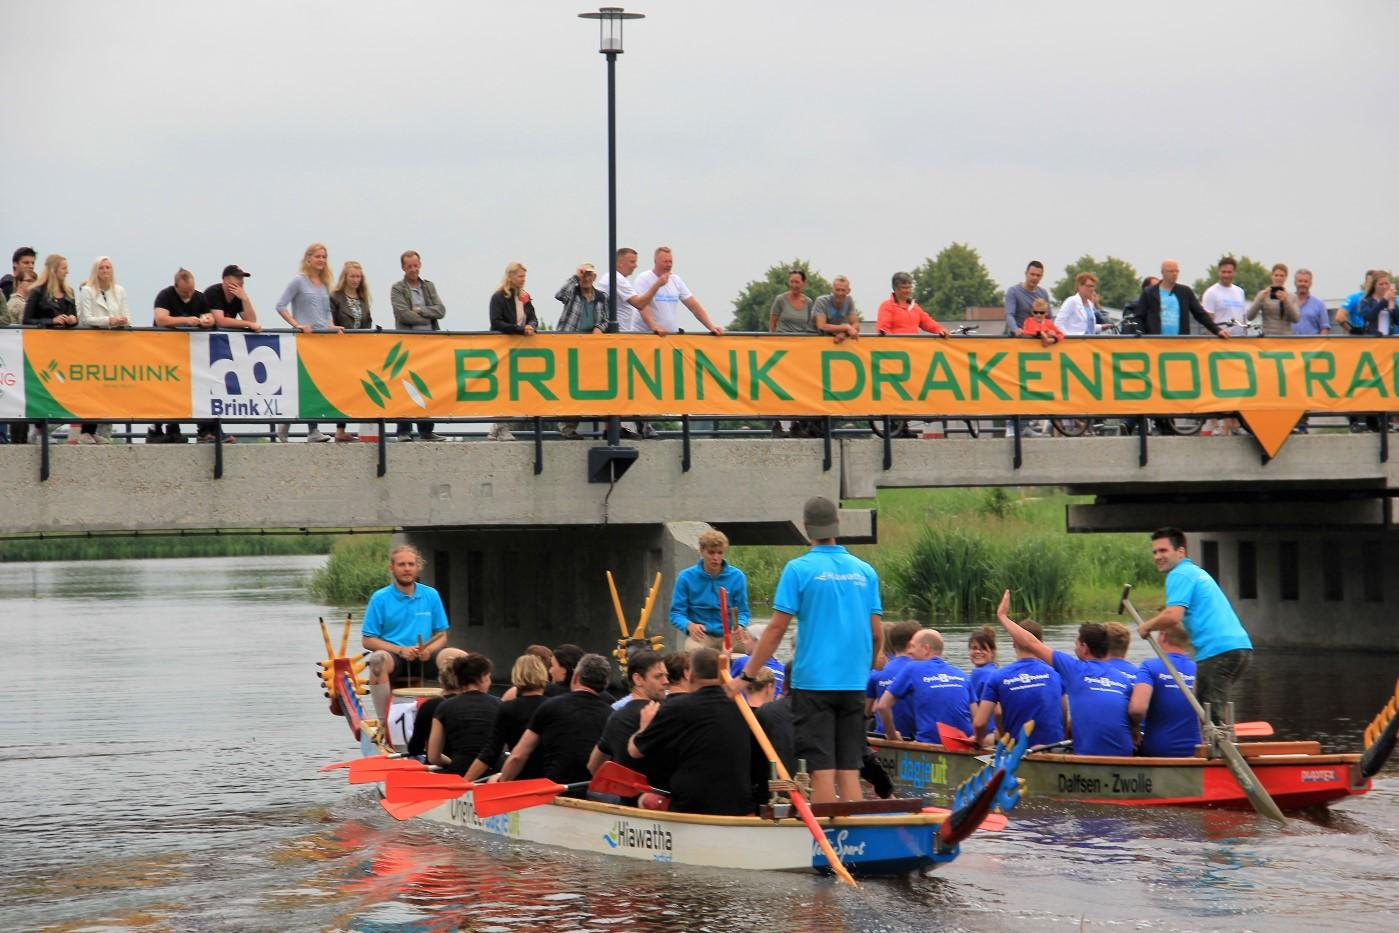 drakenbootraces 14